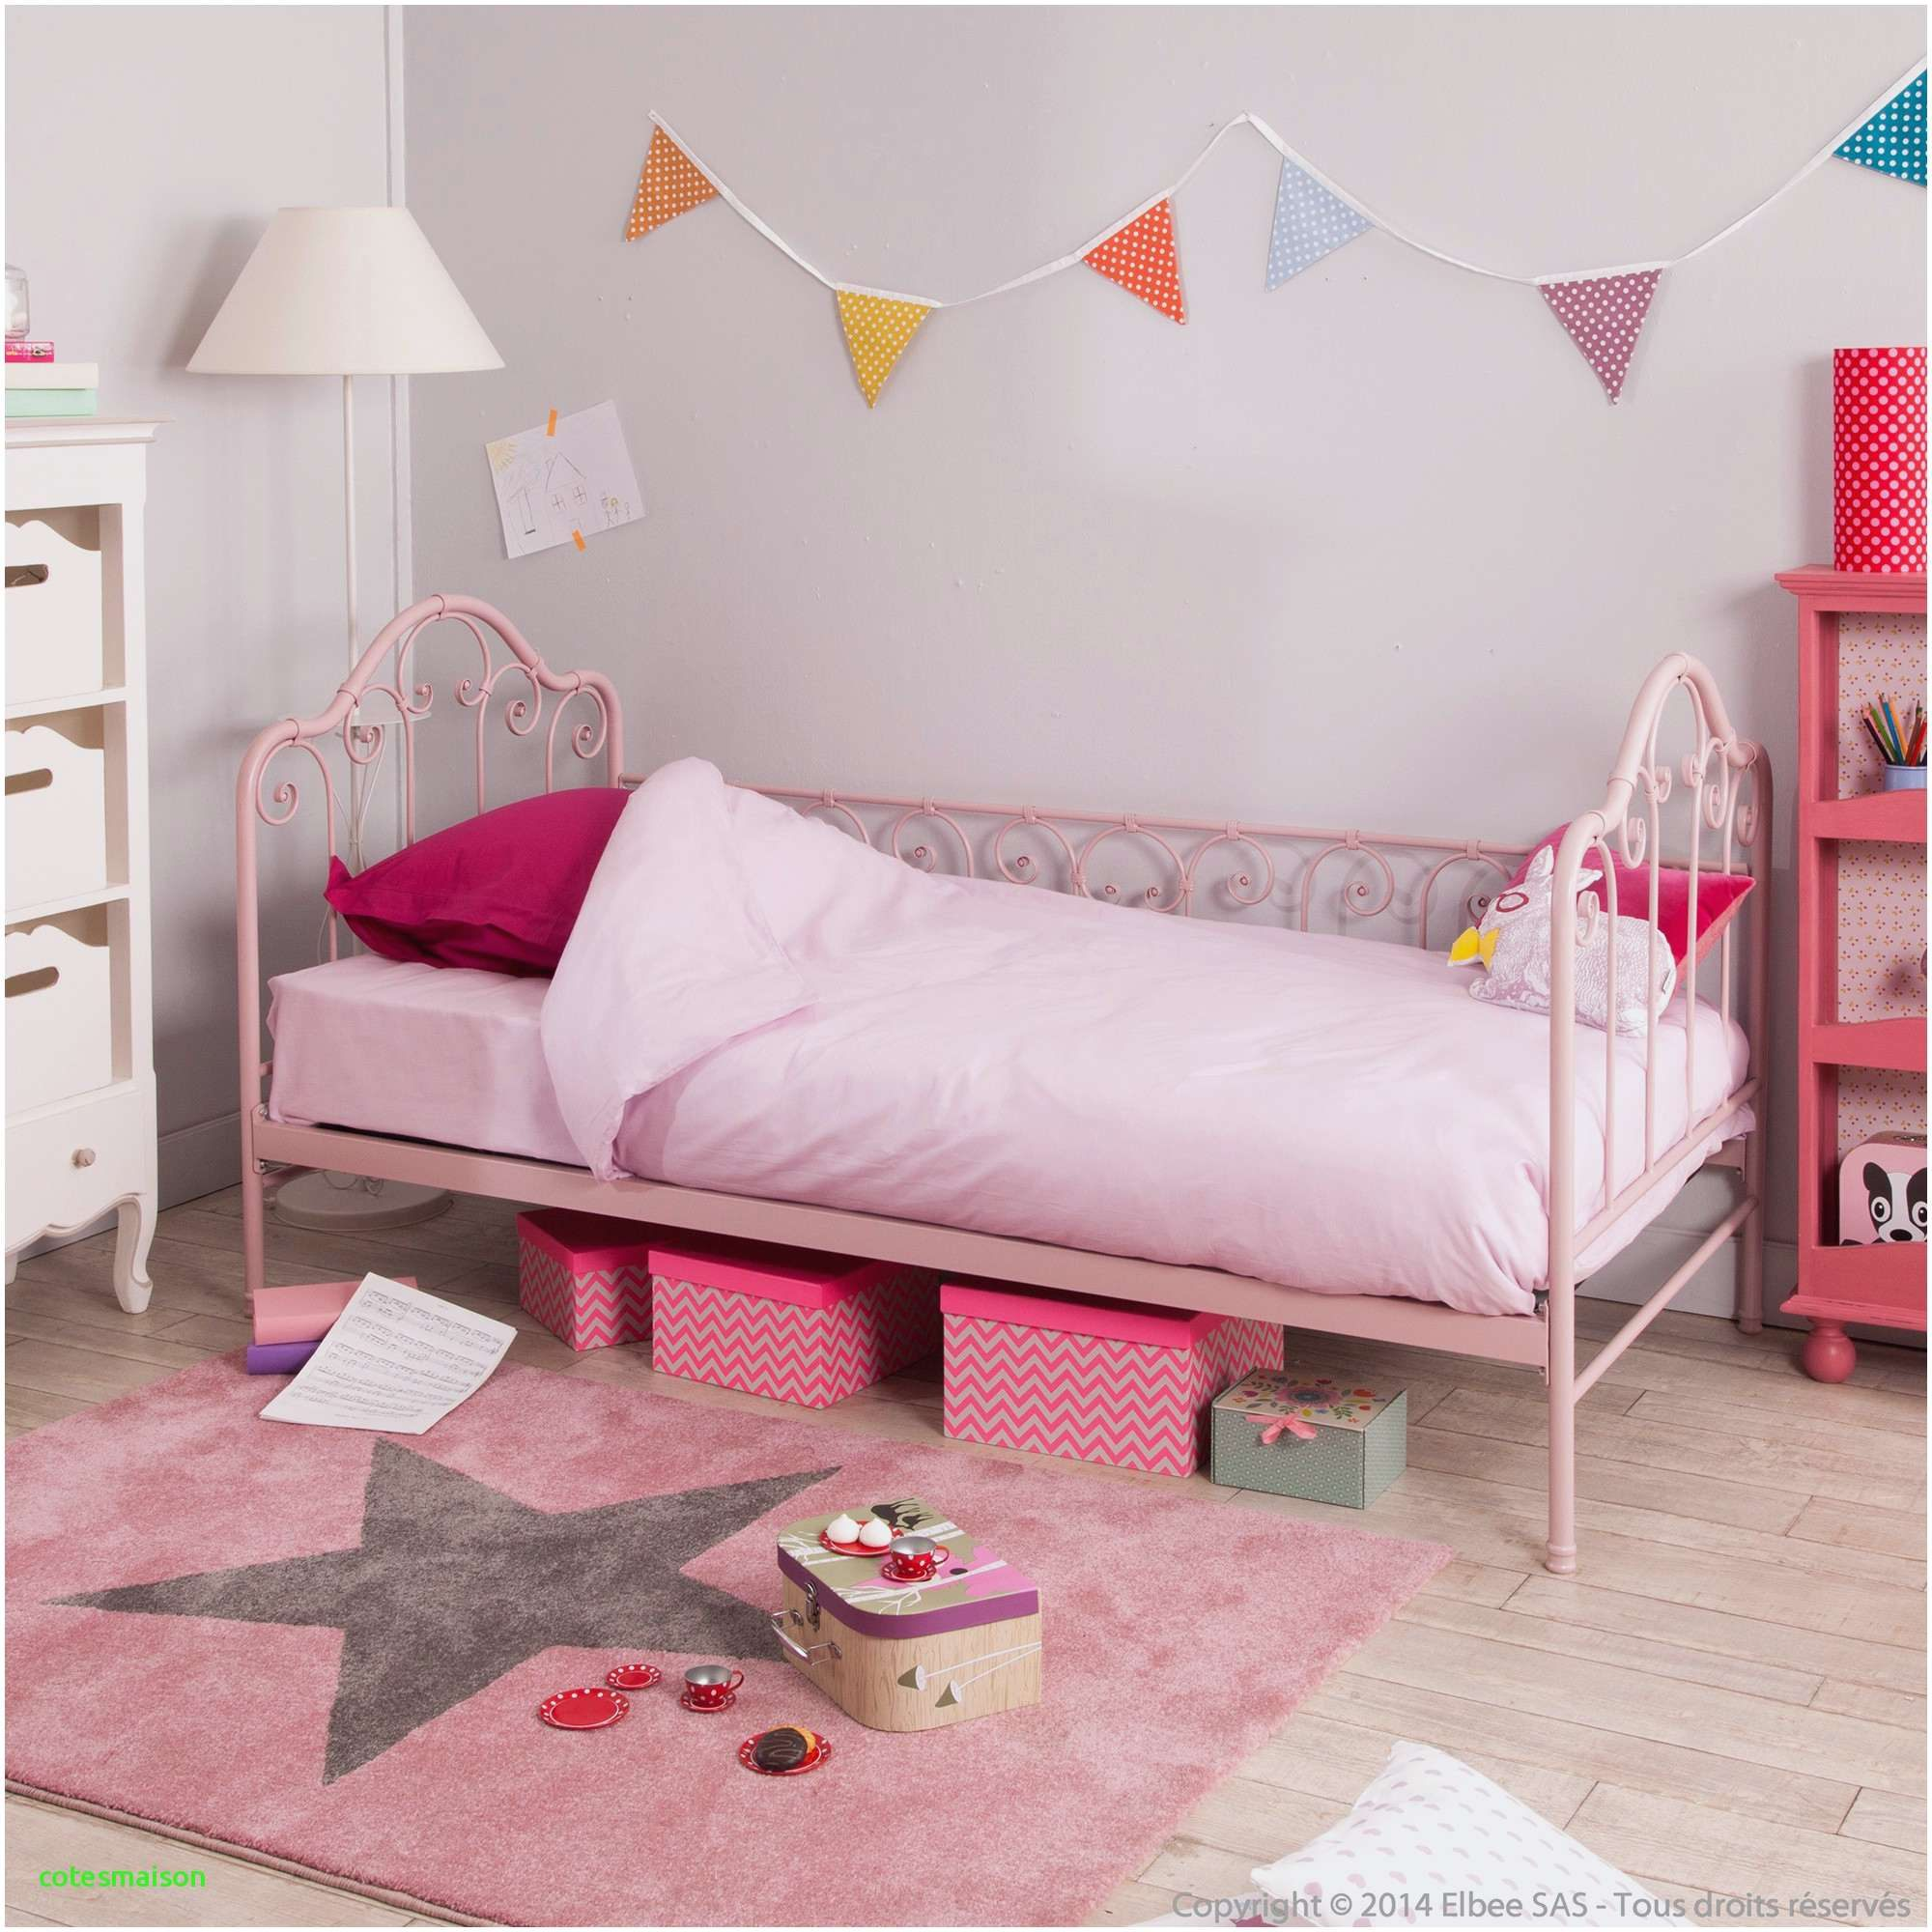 Lit Bebe Carrosse Meilleur De Lit Fille Princesse Free Kangrunmy Tente De Lit Enfant Garcon Fille